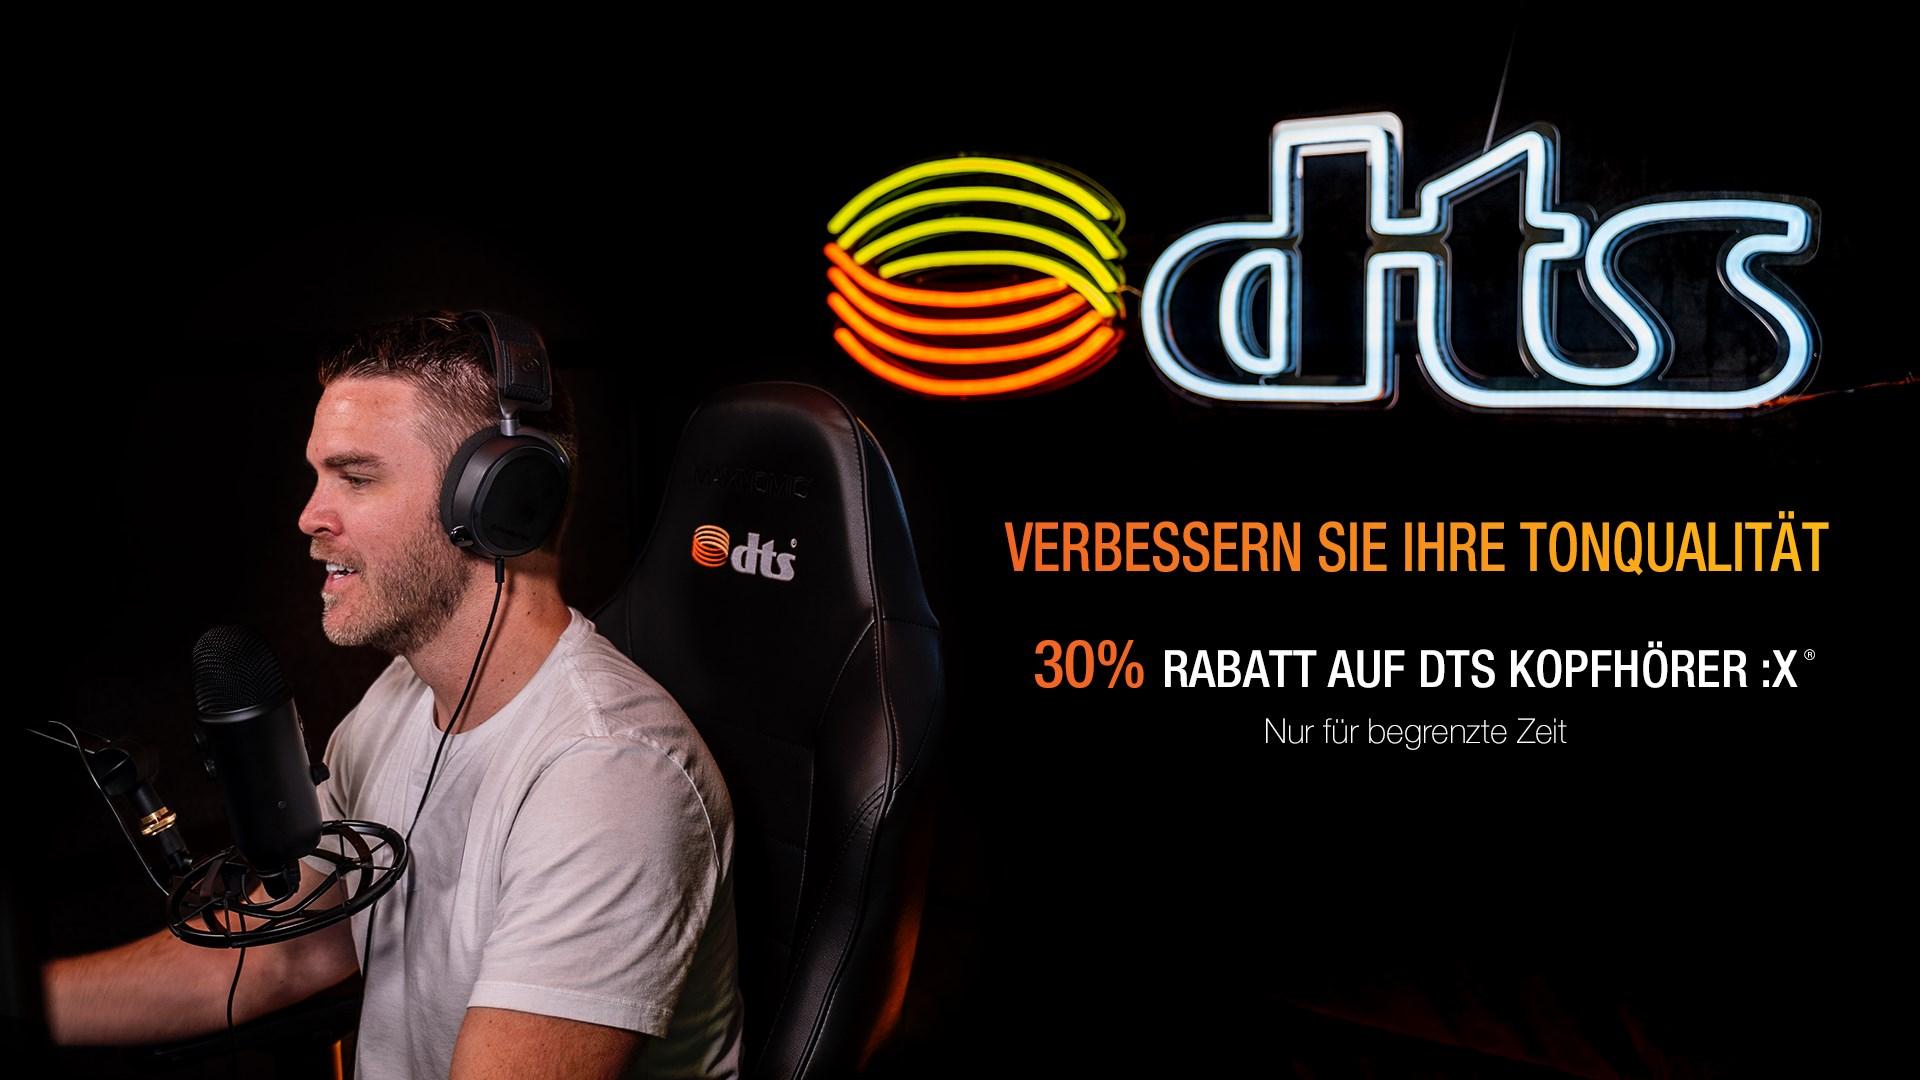 DTS Headphone:X (WIndows 10) / DTS Sound Unbound inkl. DTS:X